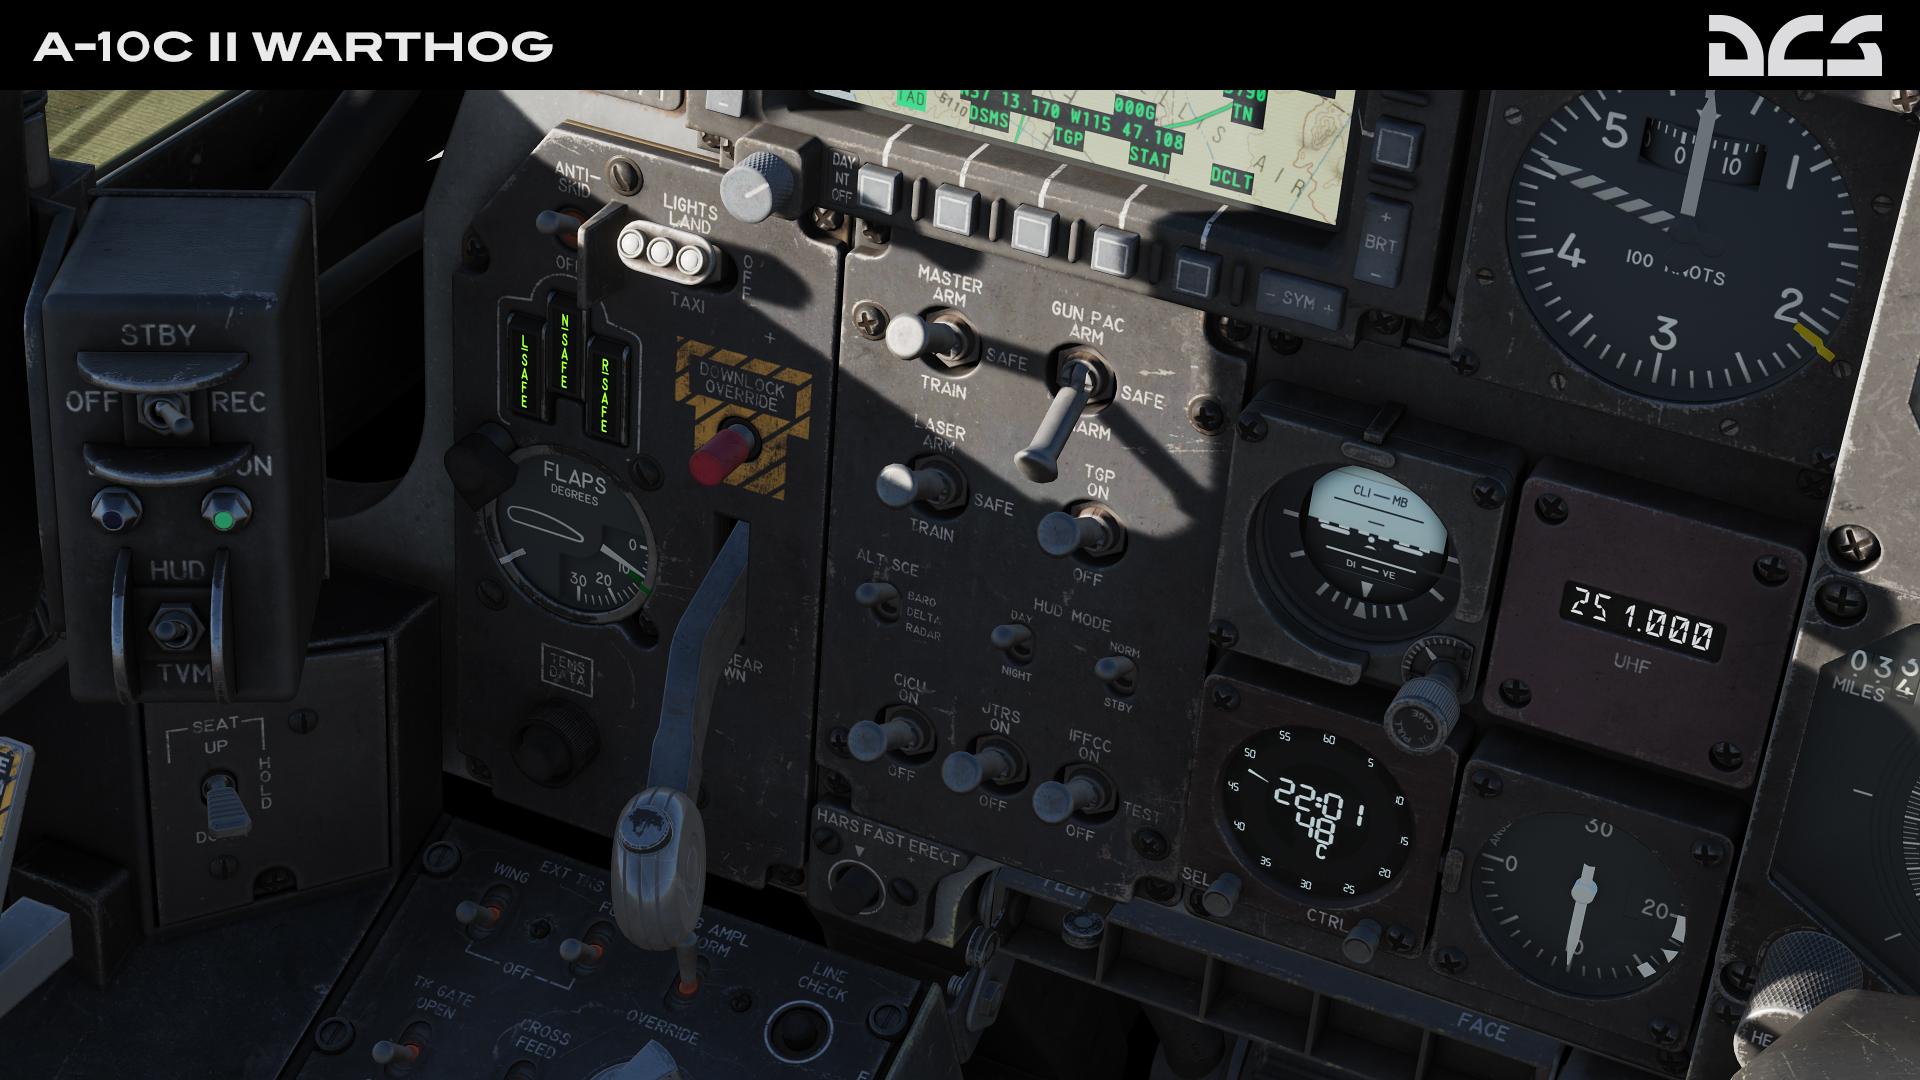 www.digitalcombatsimulator.com/upload/iblock/d20/dcs-world-a-10c-ii-04-flight-simulator.jpg